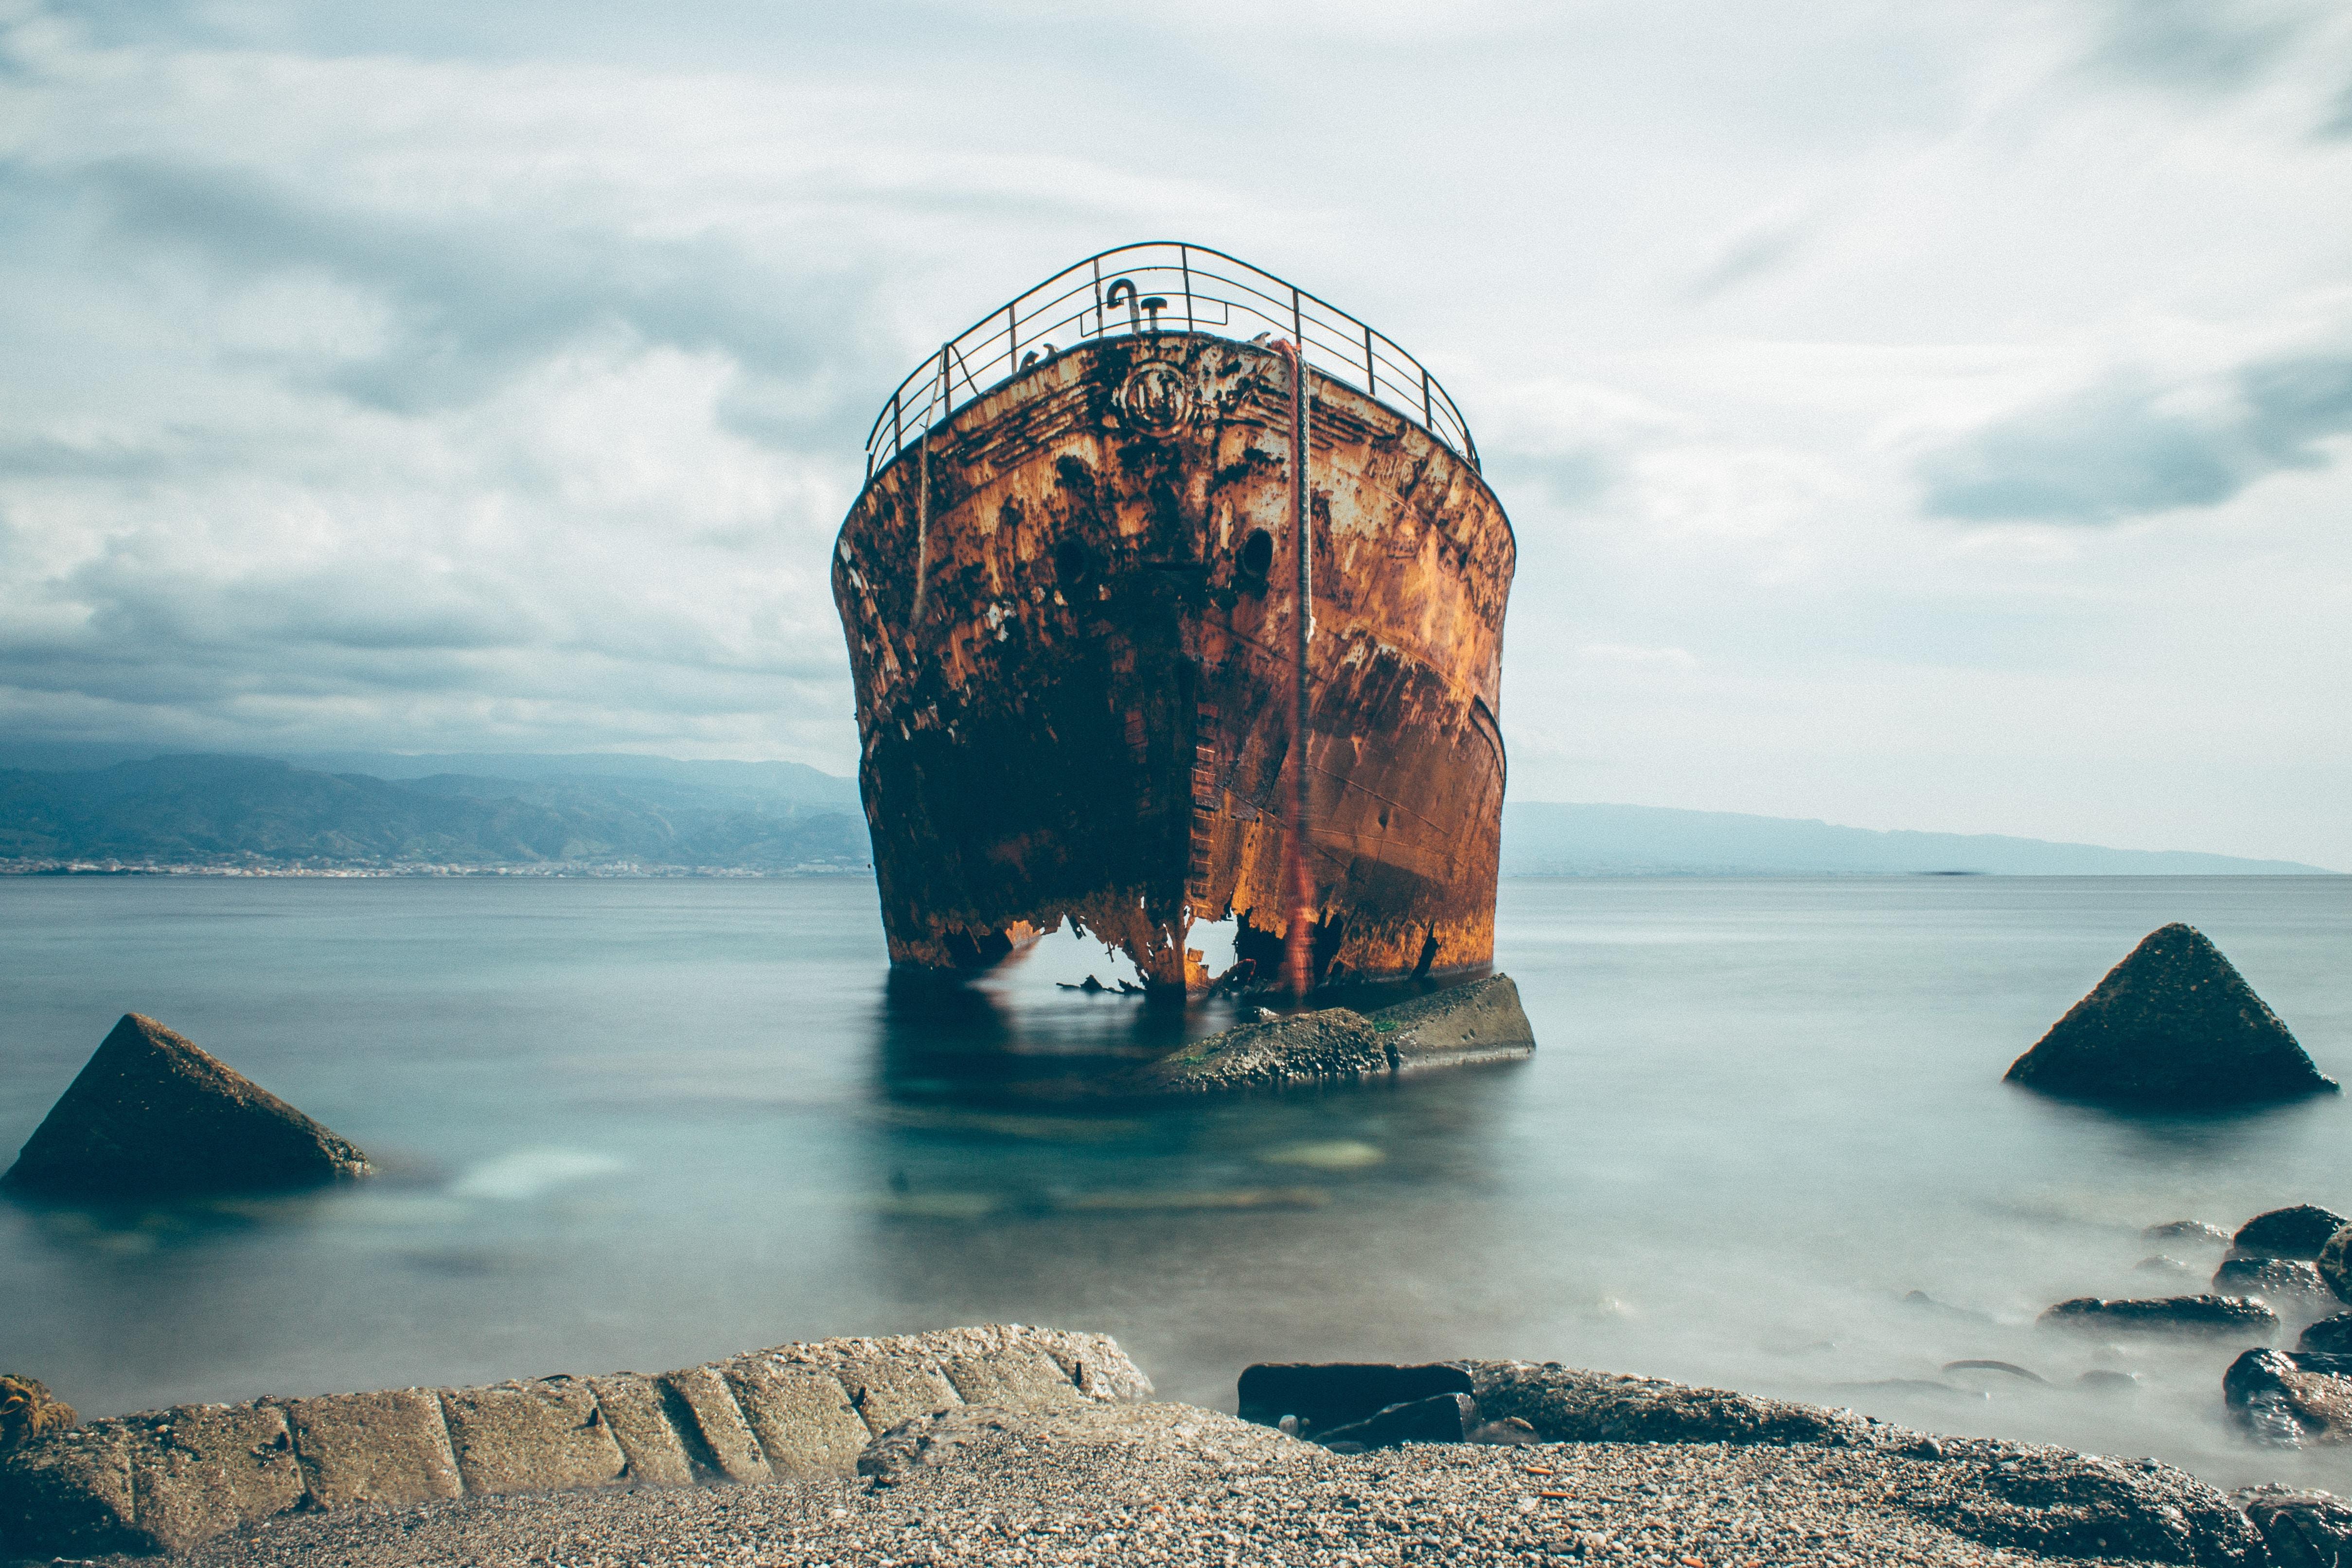 Photo by Giuseppe Murabito on Unsplash